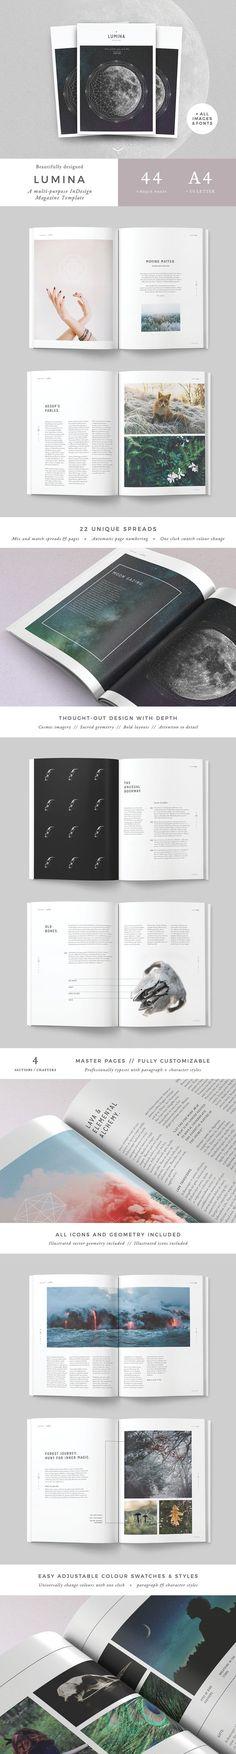 LUMINA Magazine - Magazines #template #simple